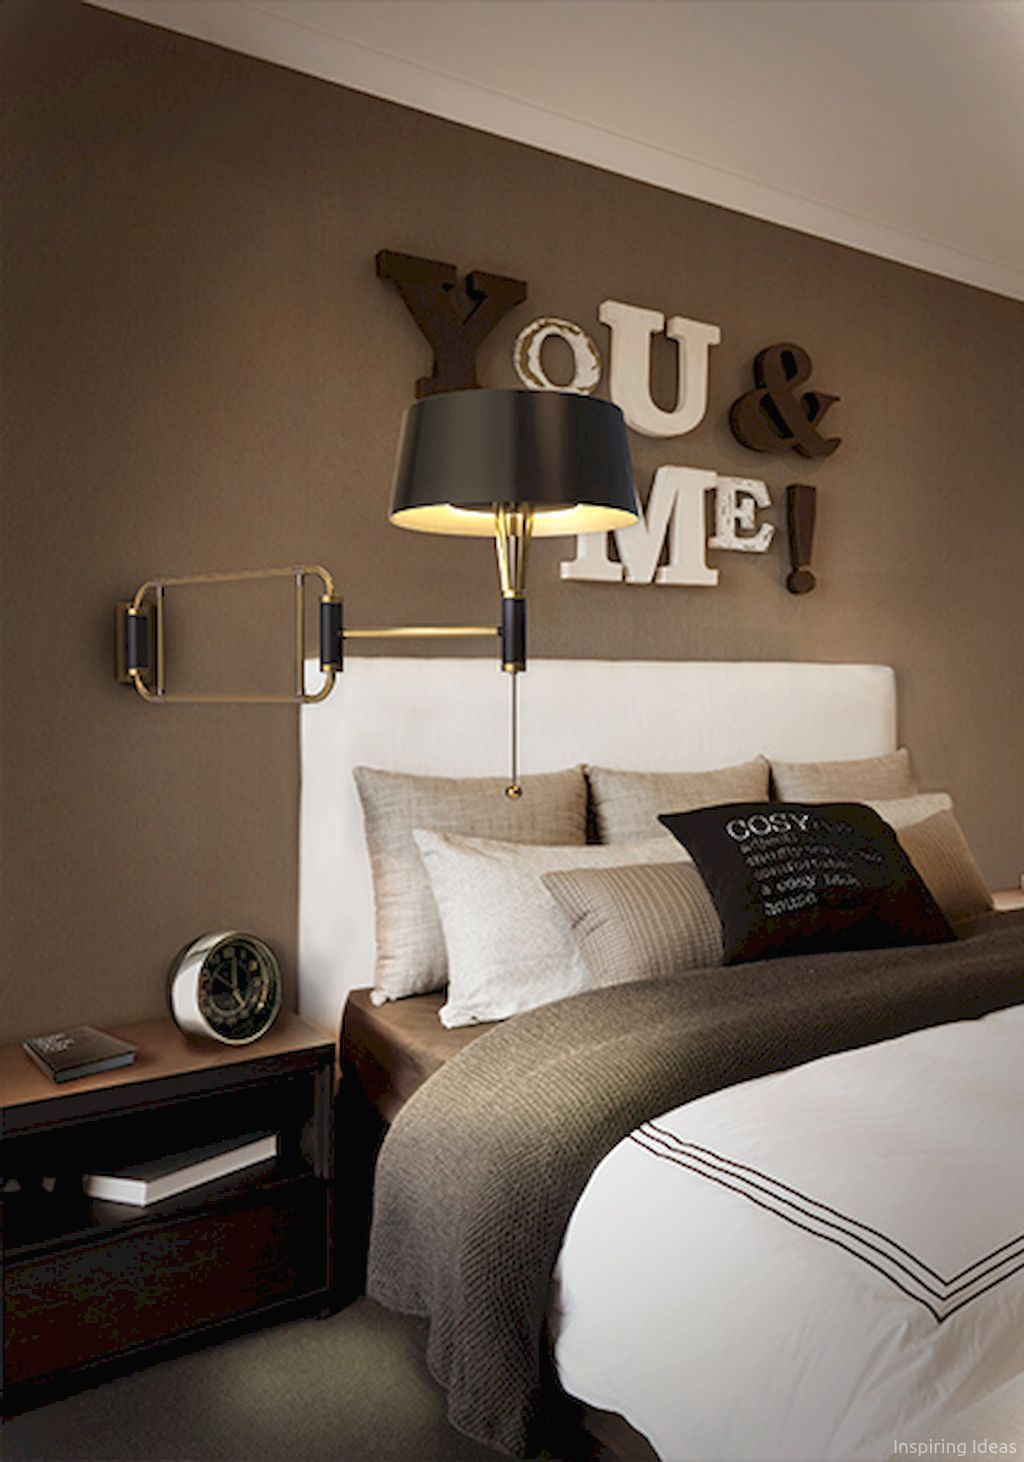 Adorable 75+ Luxurious Bed Linens Color Schemes Ideas Https://roomaniac.com